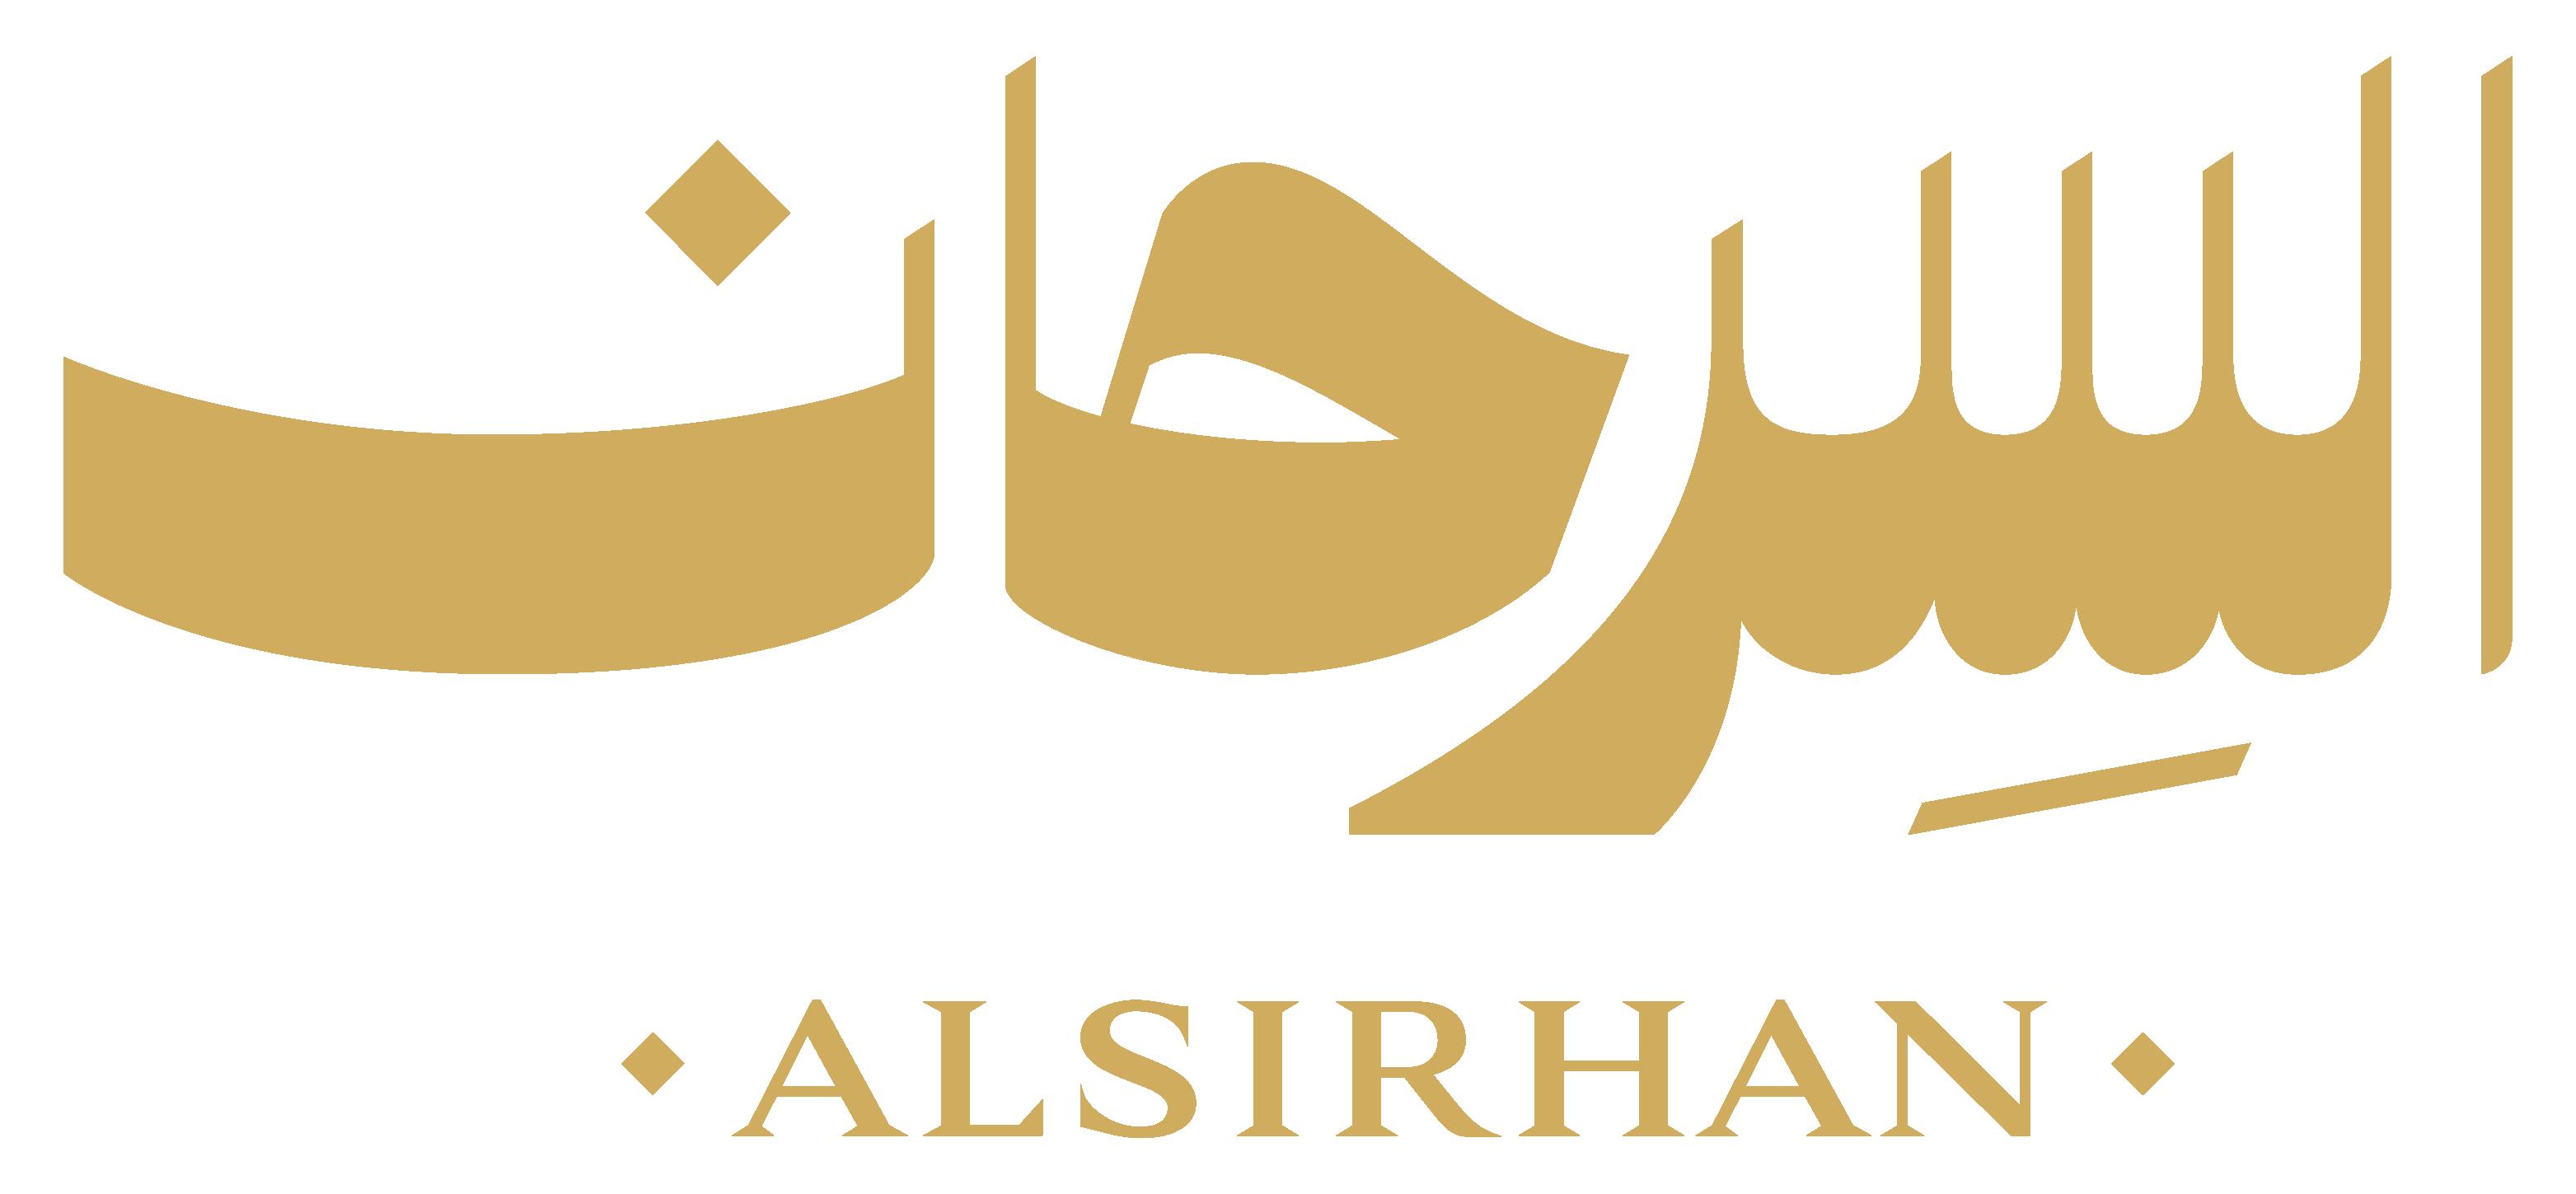 alsirhahanshoes